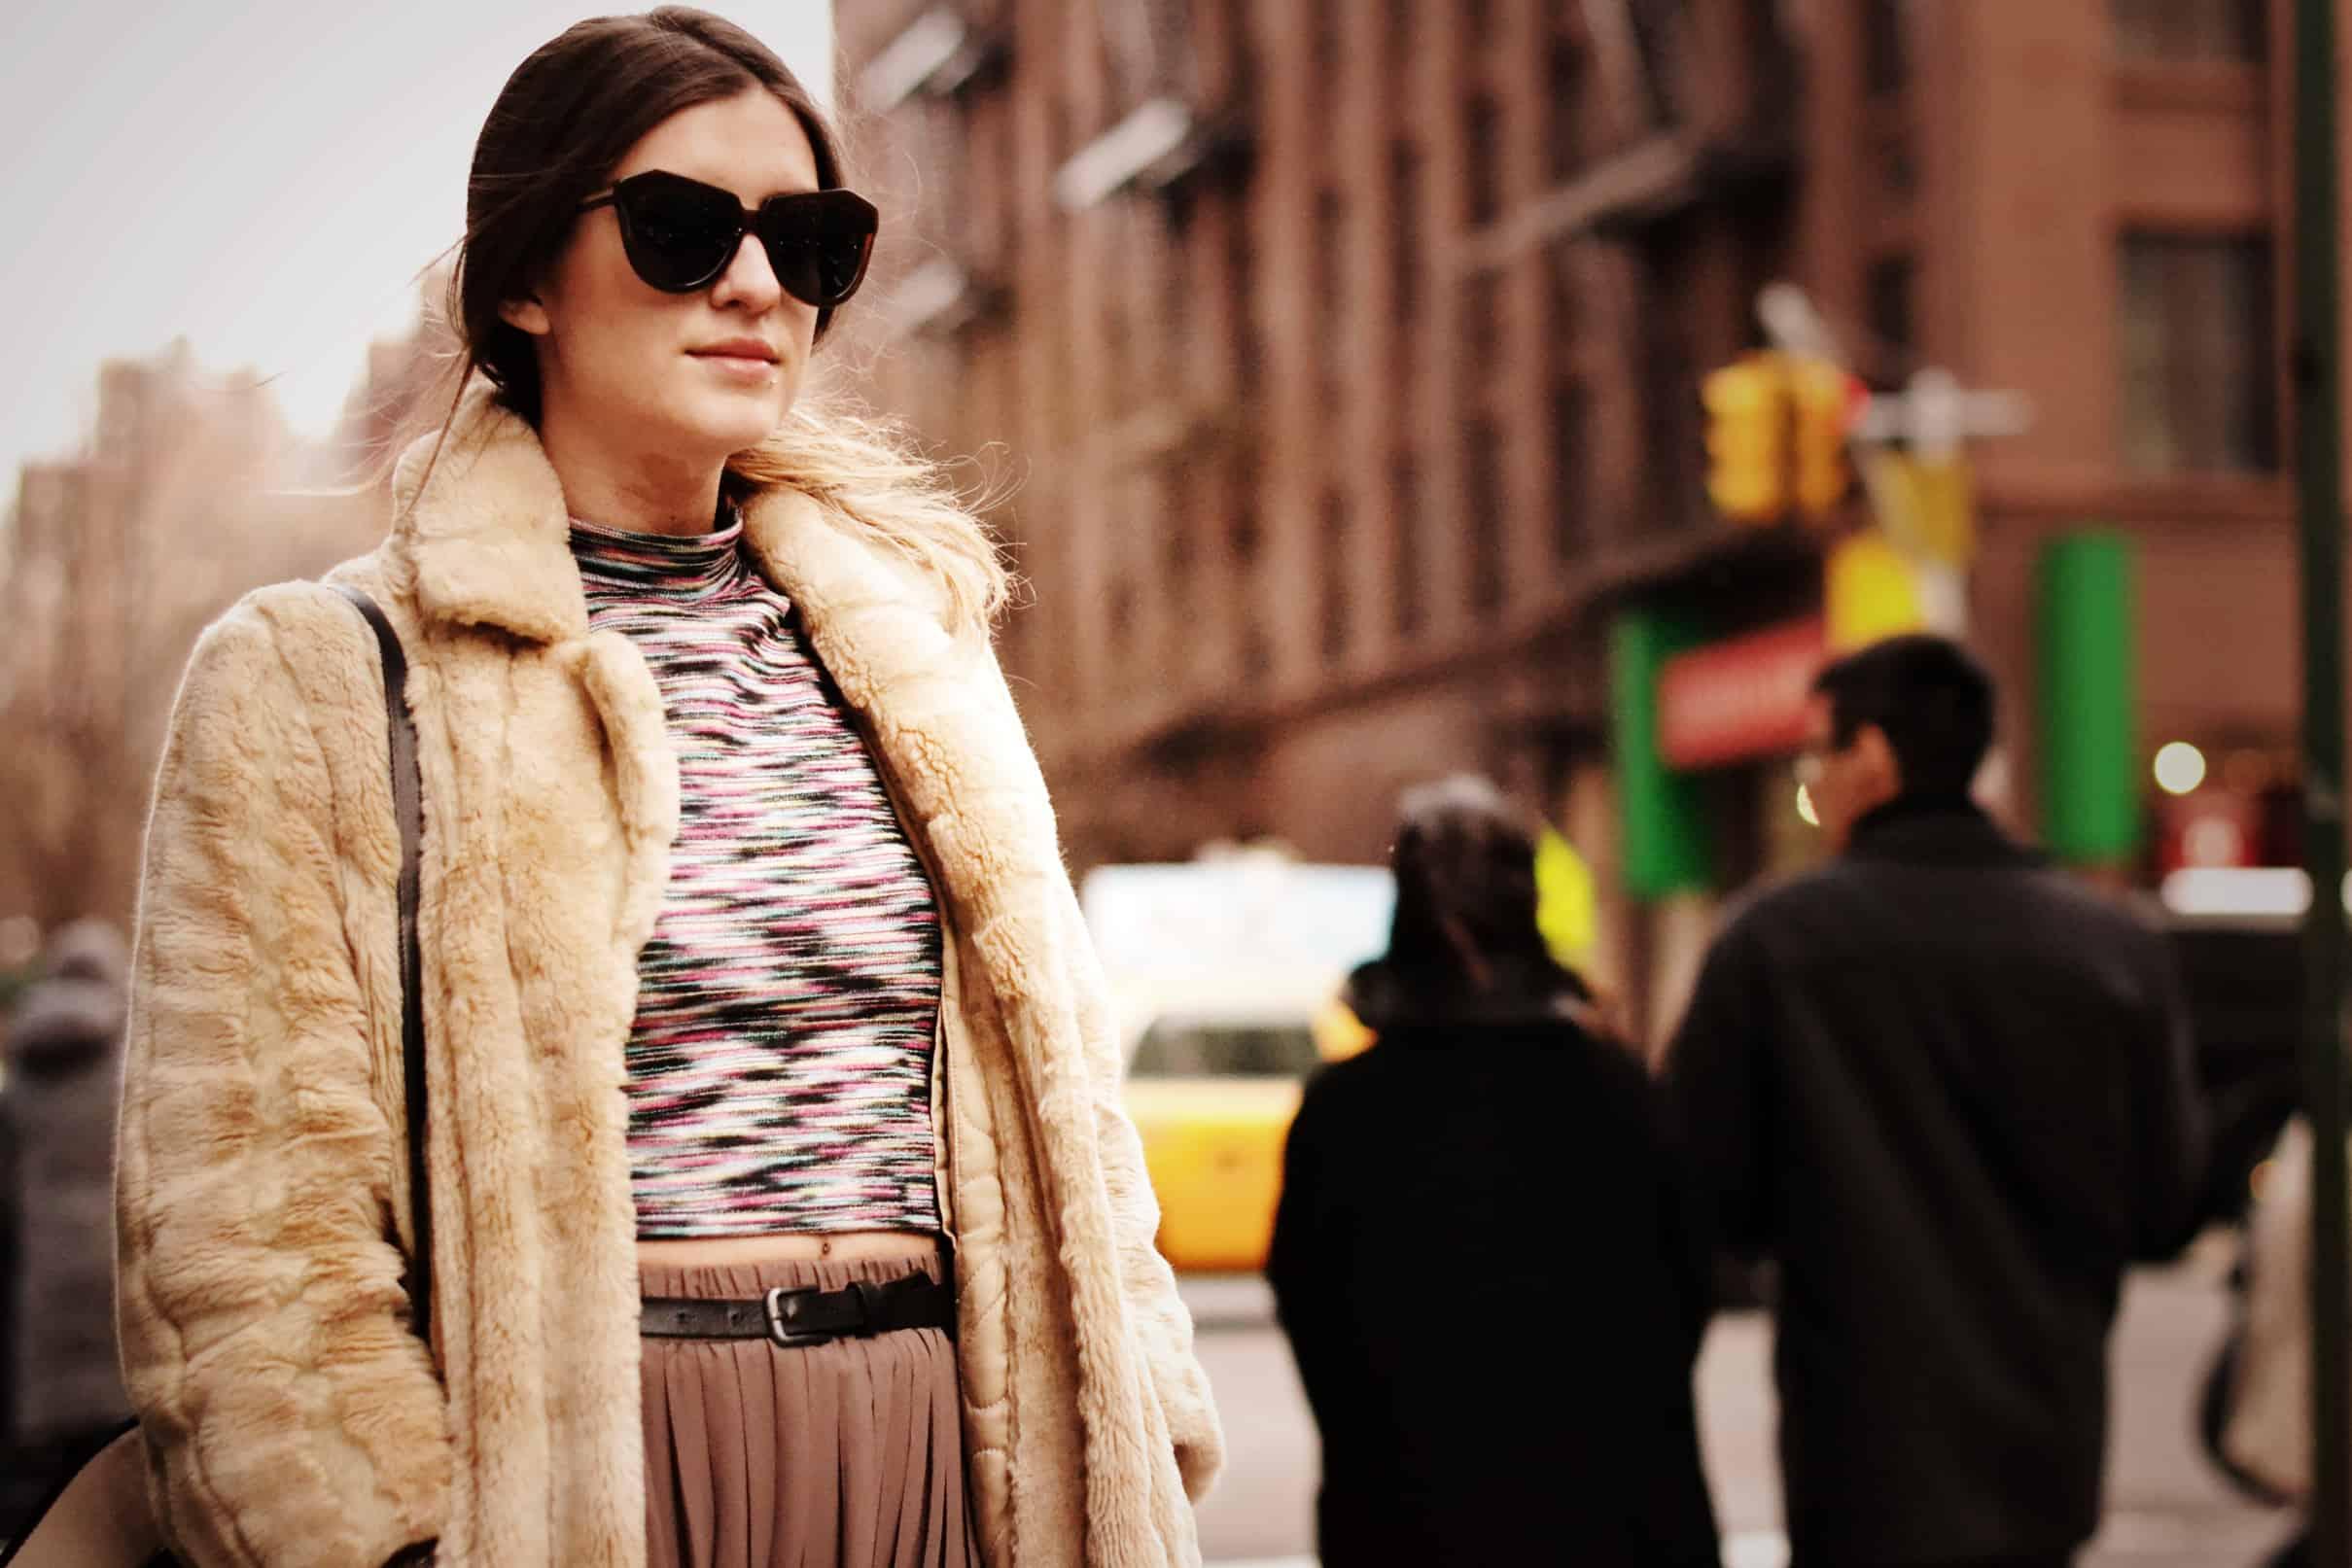 street-style-vintage-fur-coats (10)